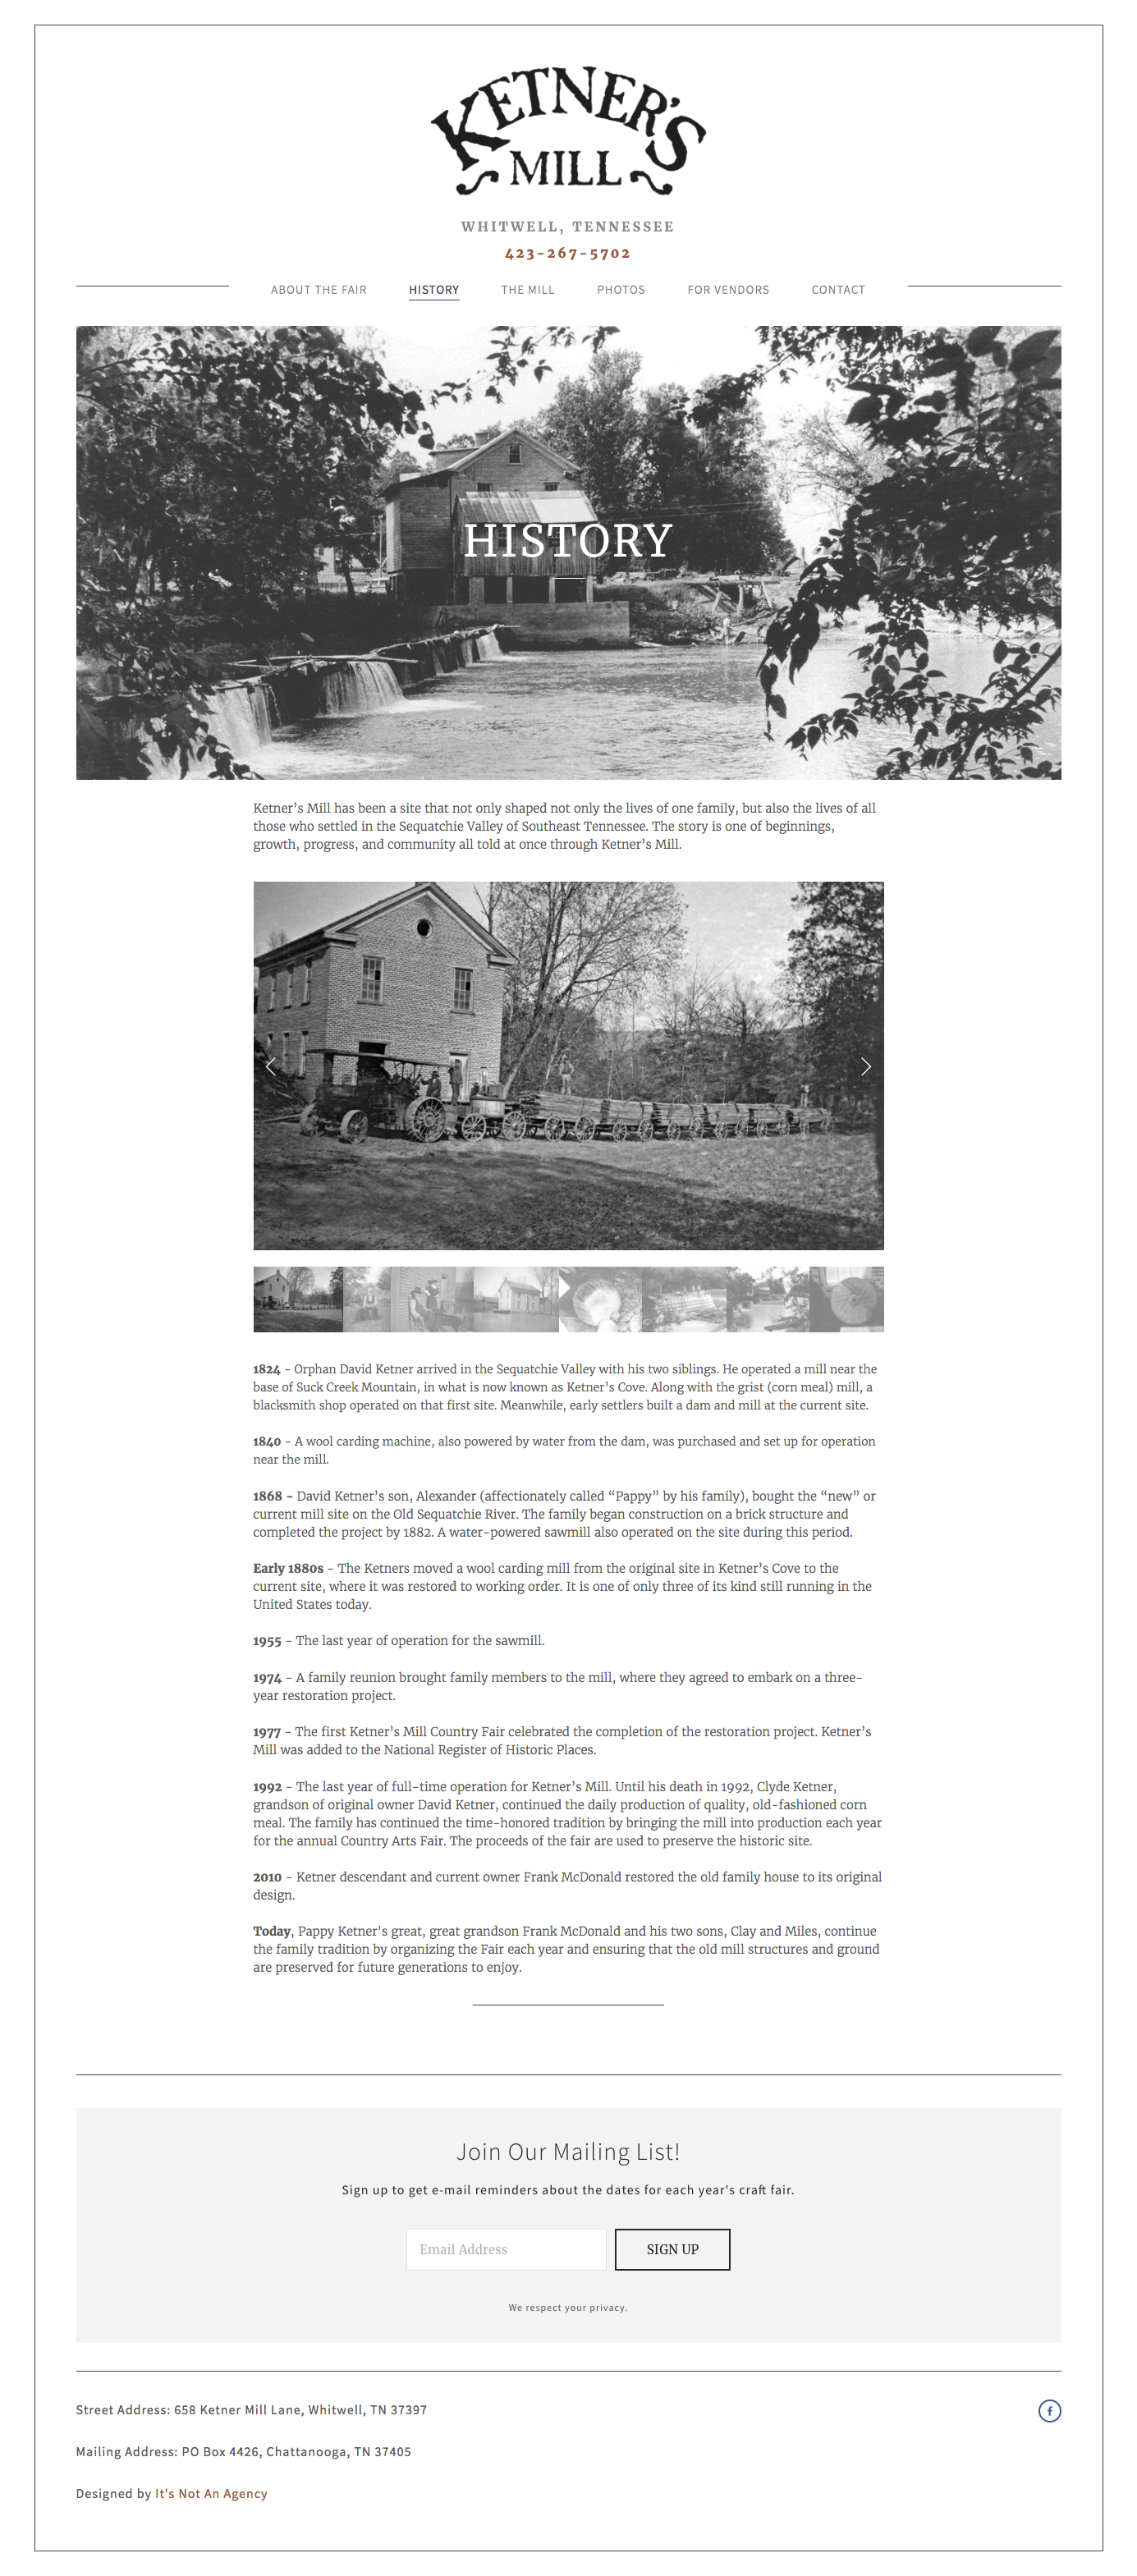 screencapture-ketnersmill-org-history-1488820705247.png